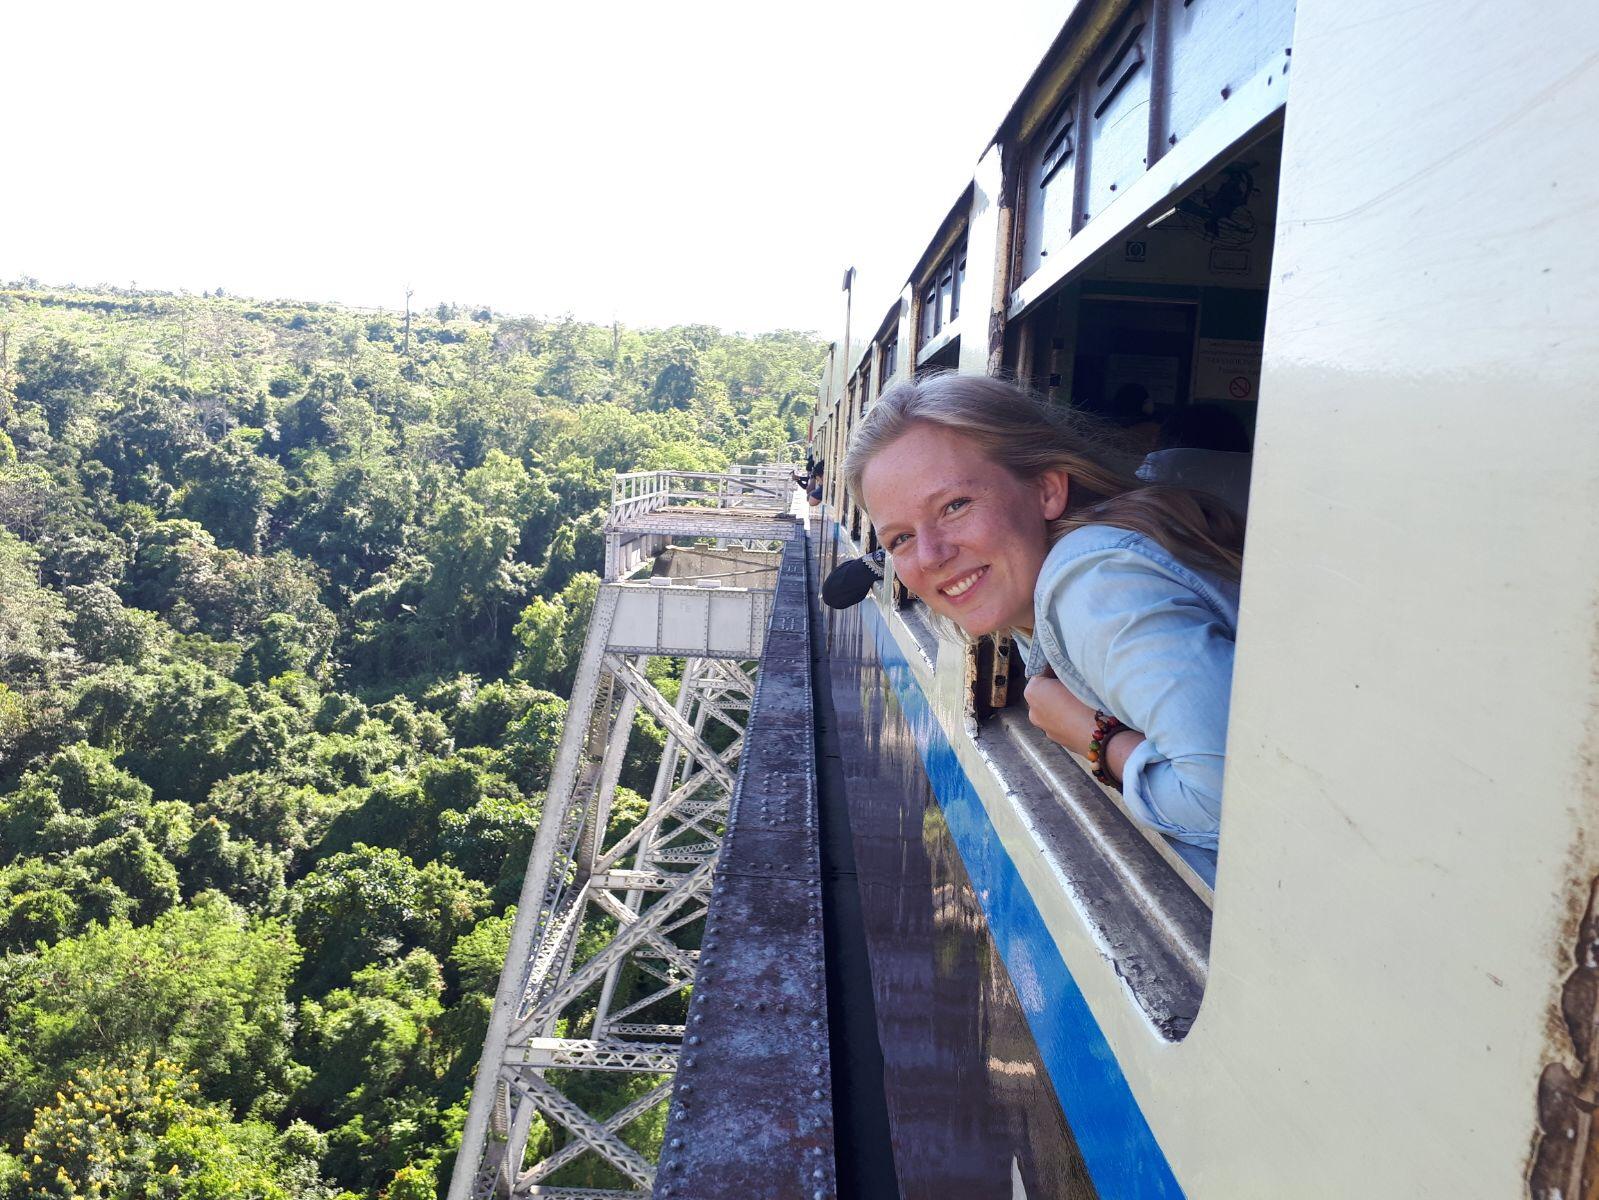 The Gokteik Viaduct | Myanmar Train Travel | From Hsipaw to Pyin Oo Lwin